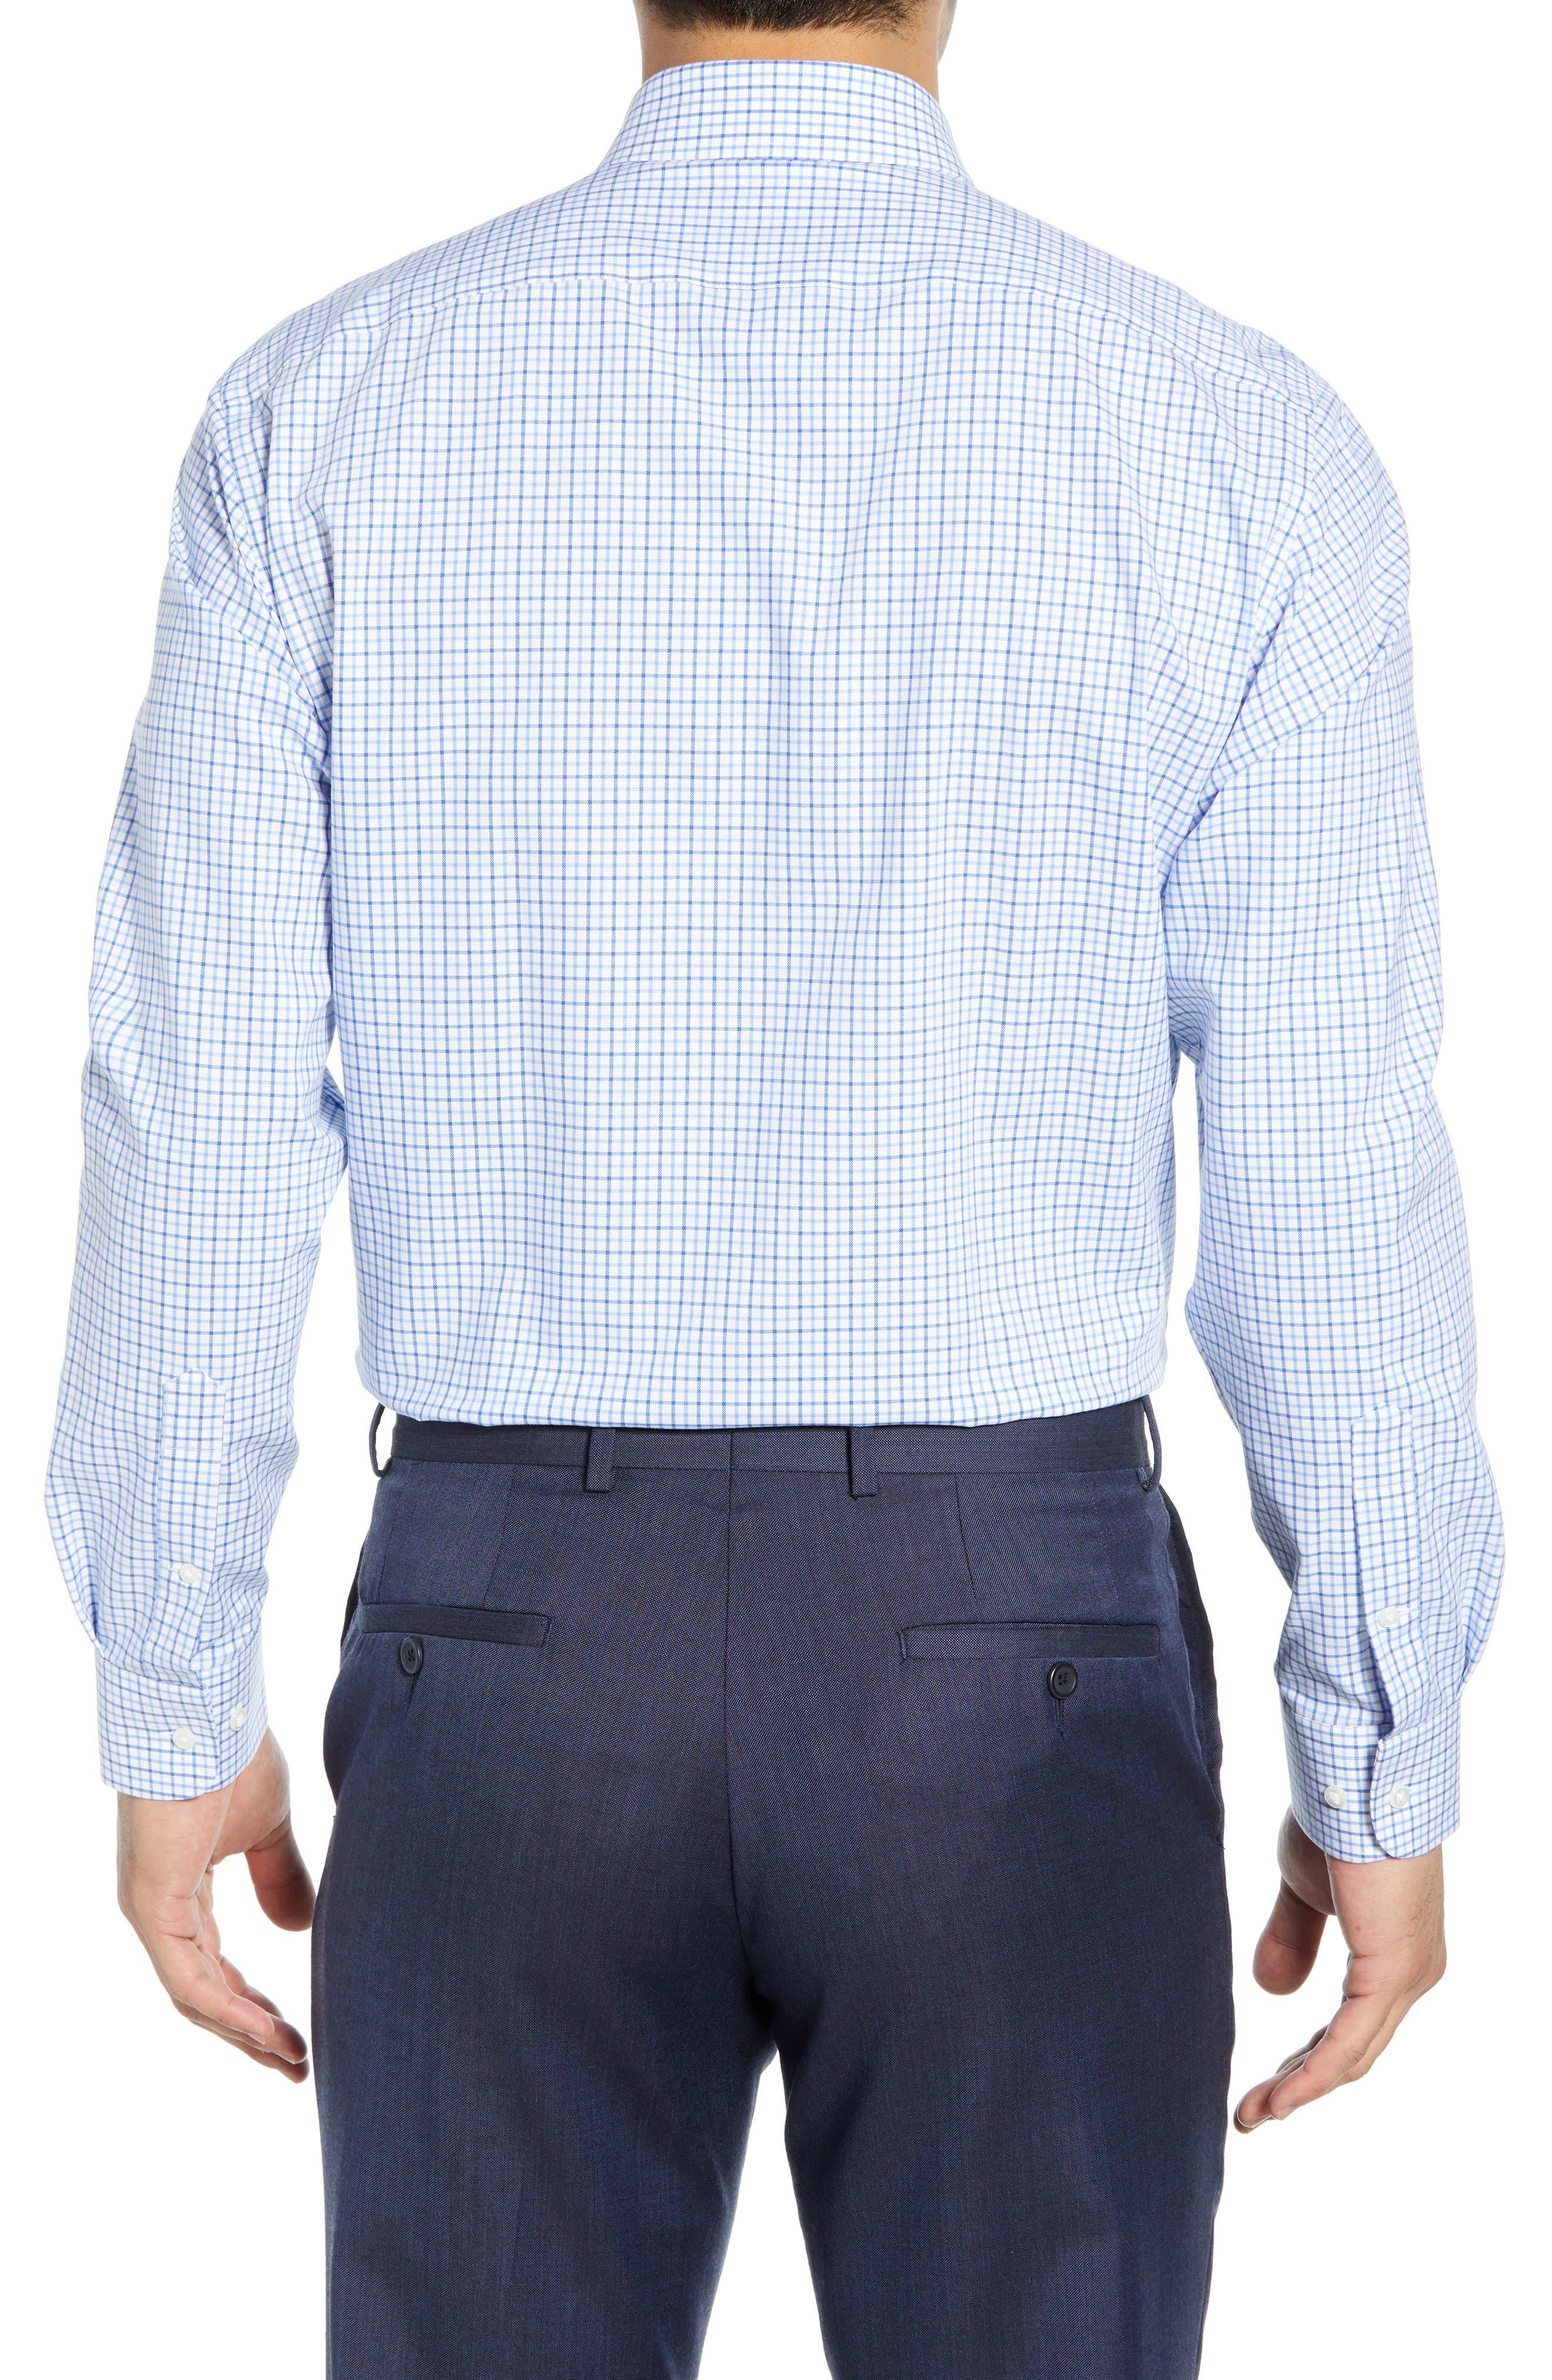 NORDSTROM MEN'S SHOP,                             Tech-Smart Traditional Fit Check Stretch Dress Shirt,                             Alternate thumbnail 3, color,                             BLUE VICTORIA